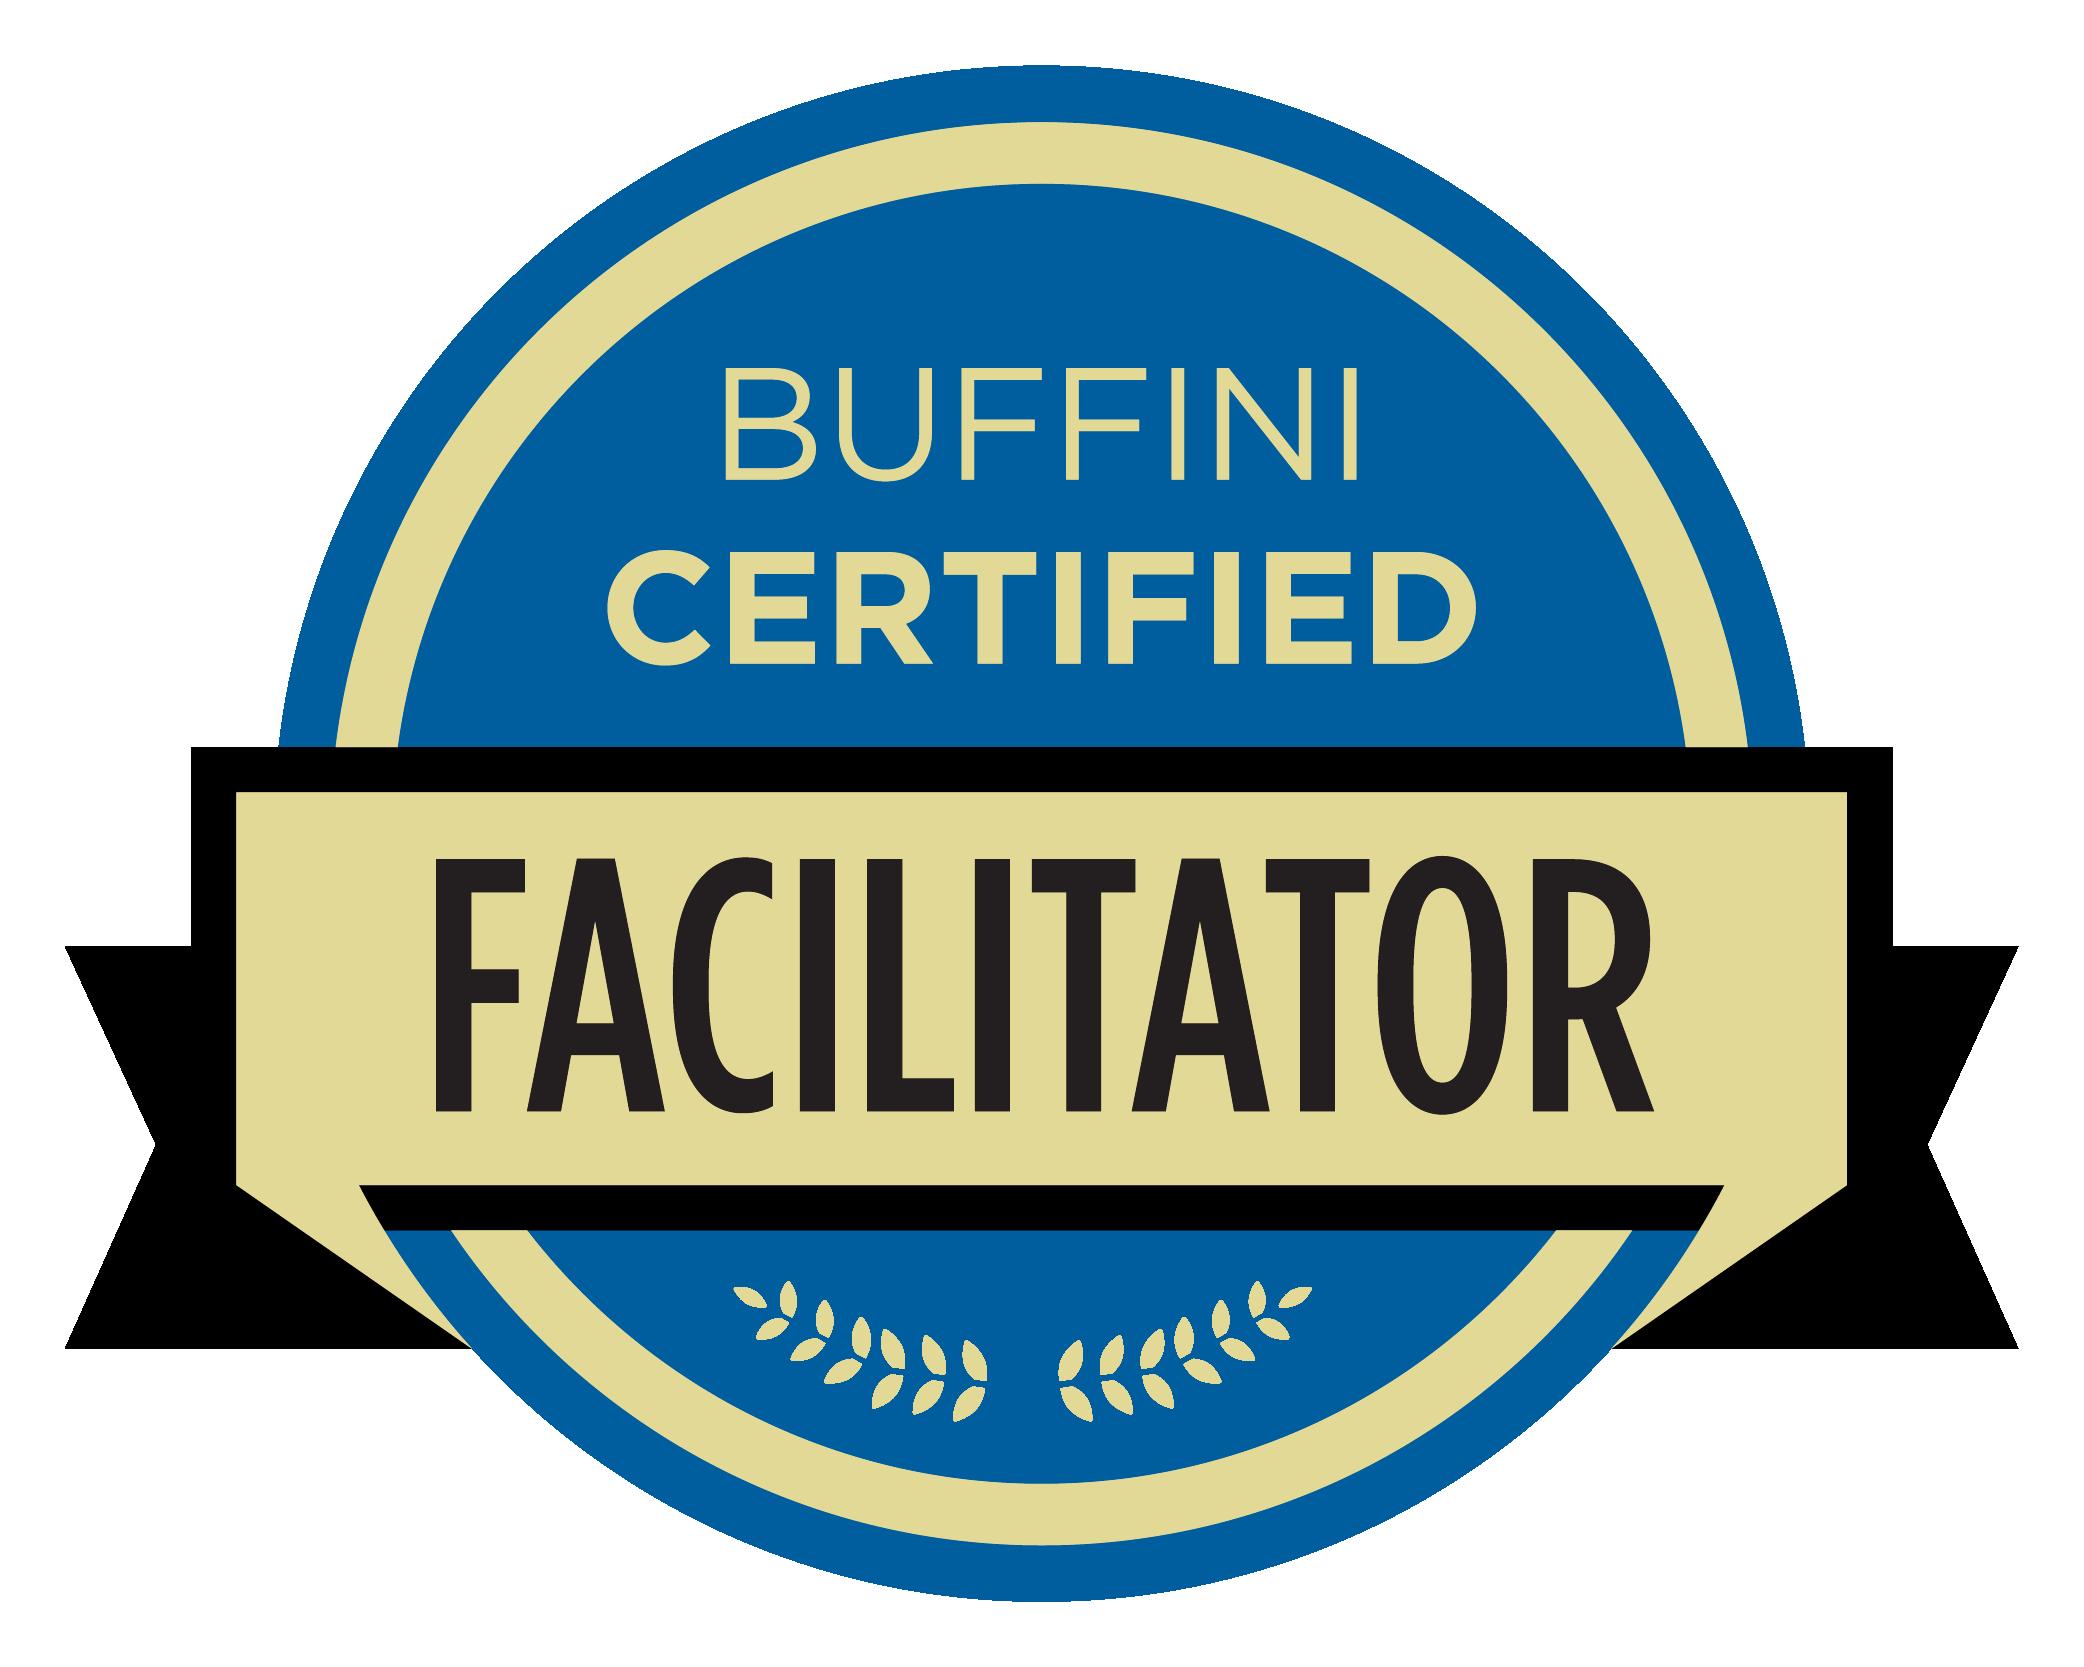 Buffini Certified Facilitator